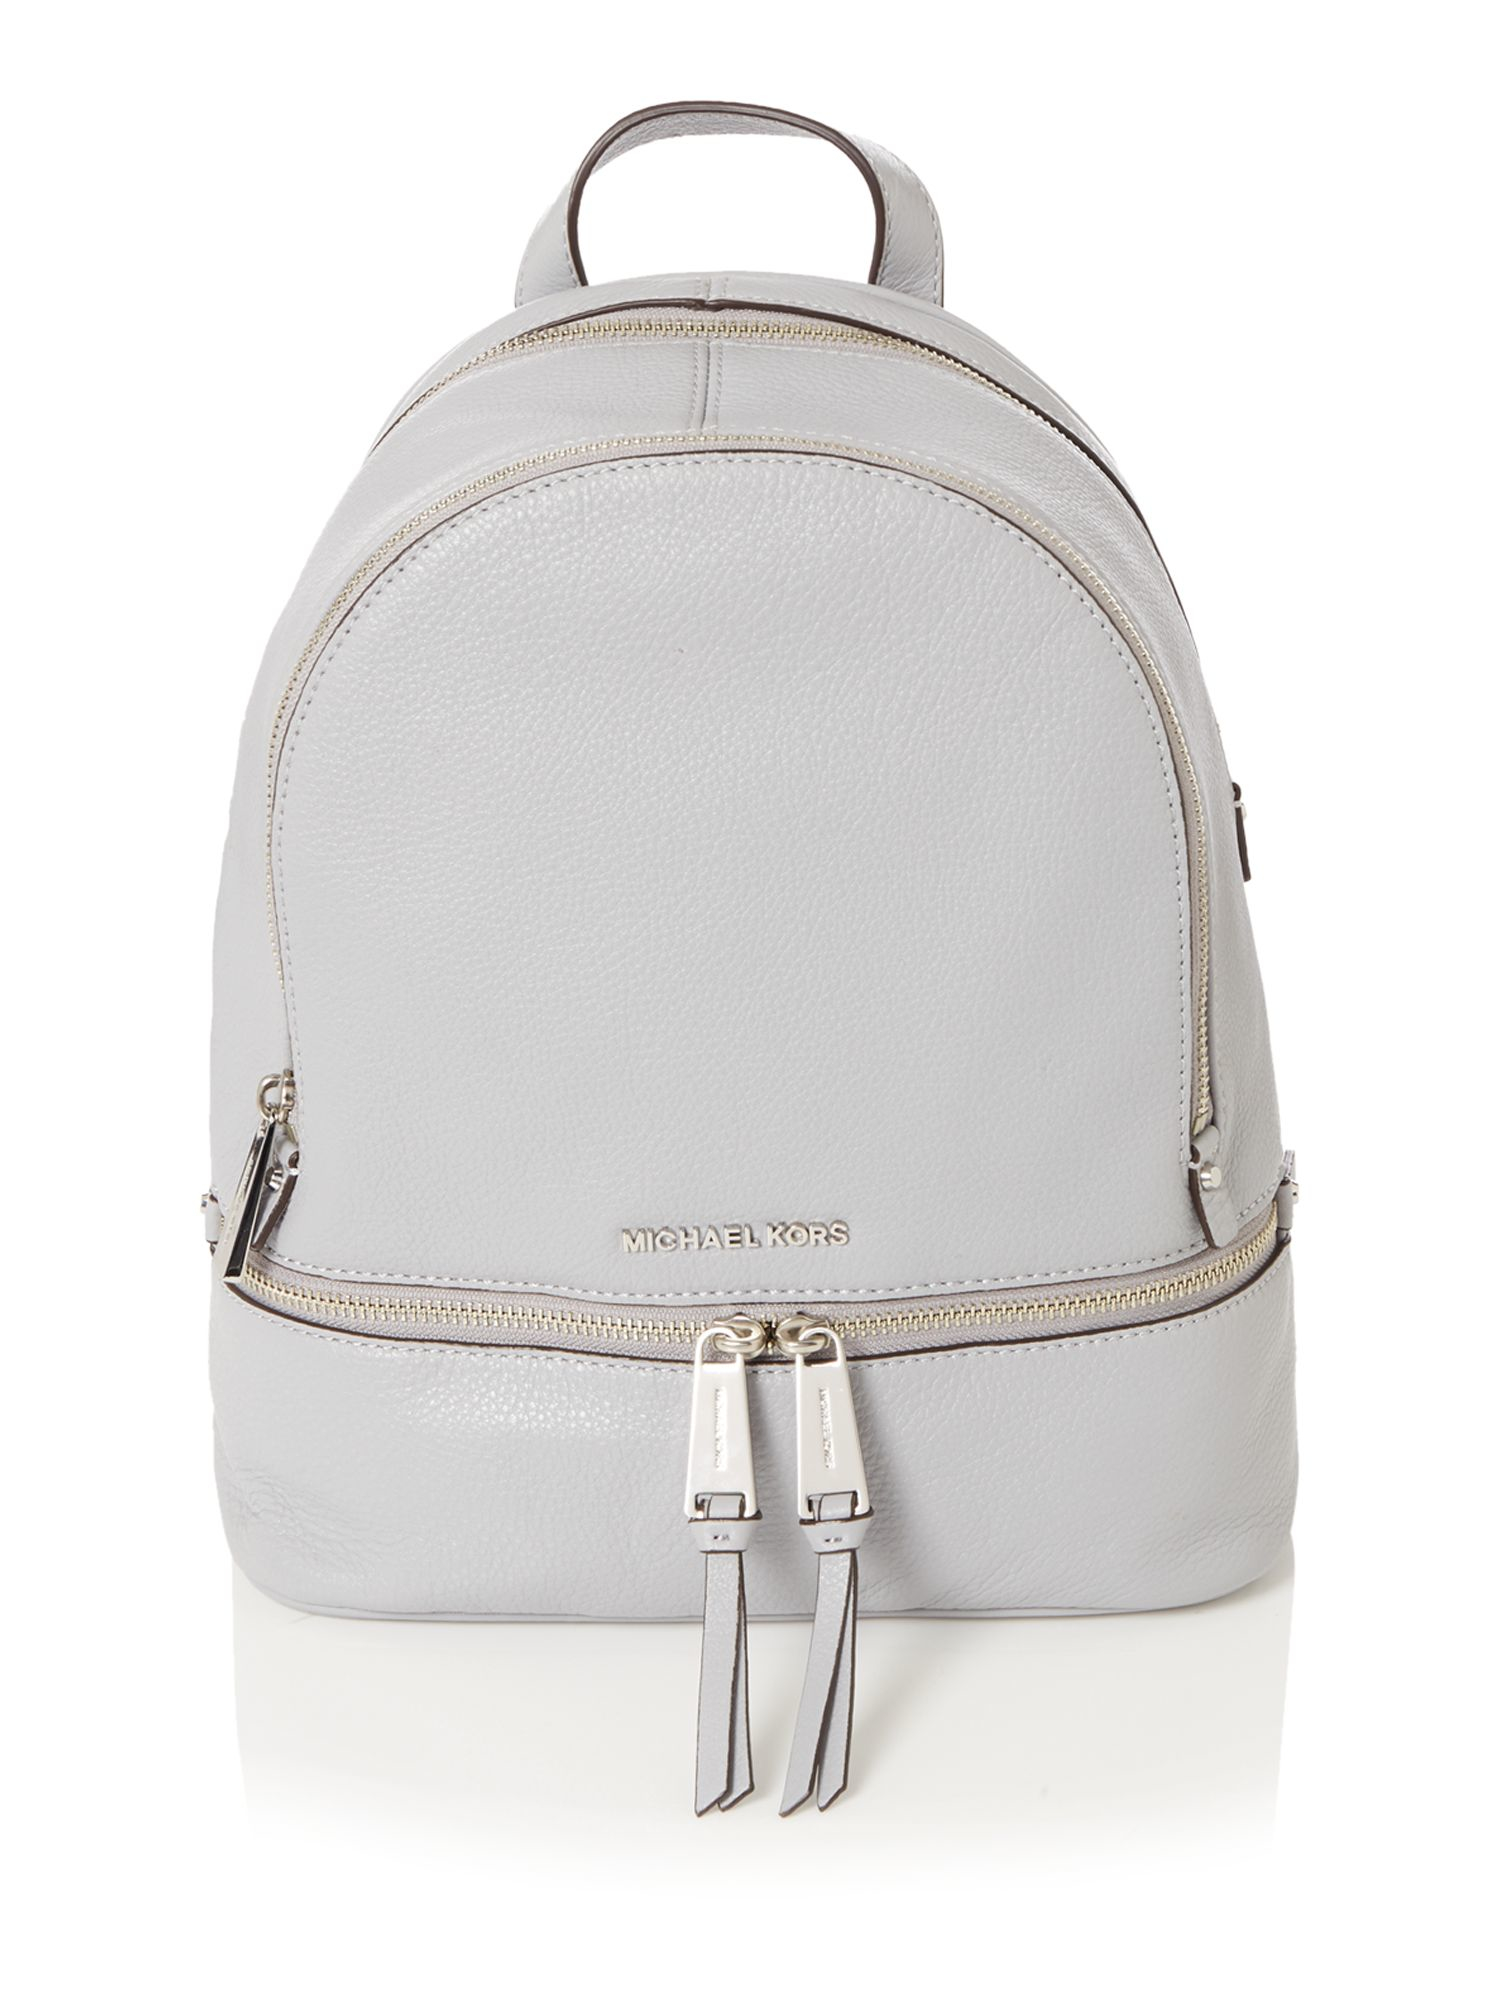 michael kors rhea zip grey backpack in gray lyst. Black Bedroom Furniture Sets. Home Design Ideas